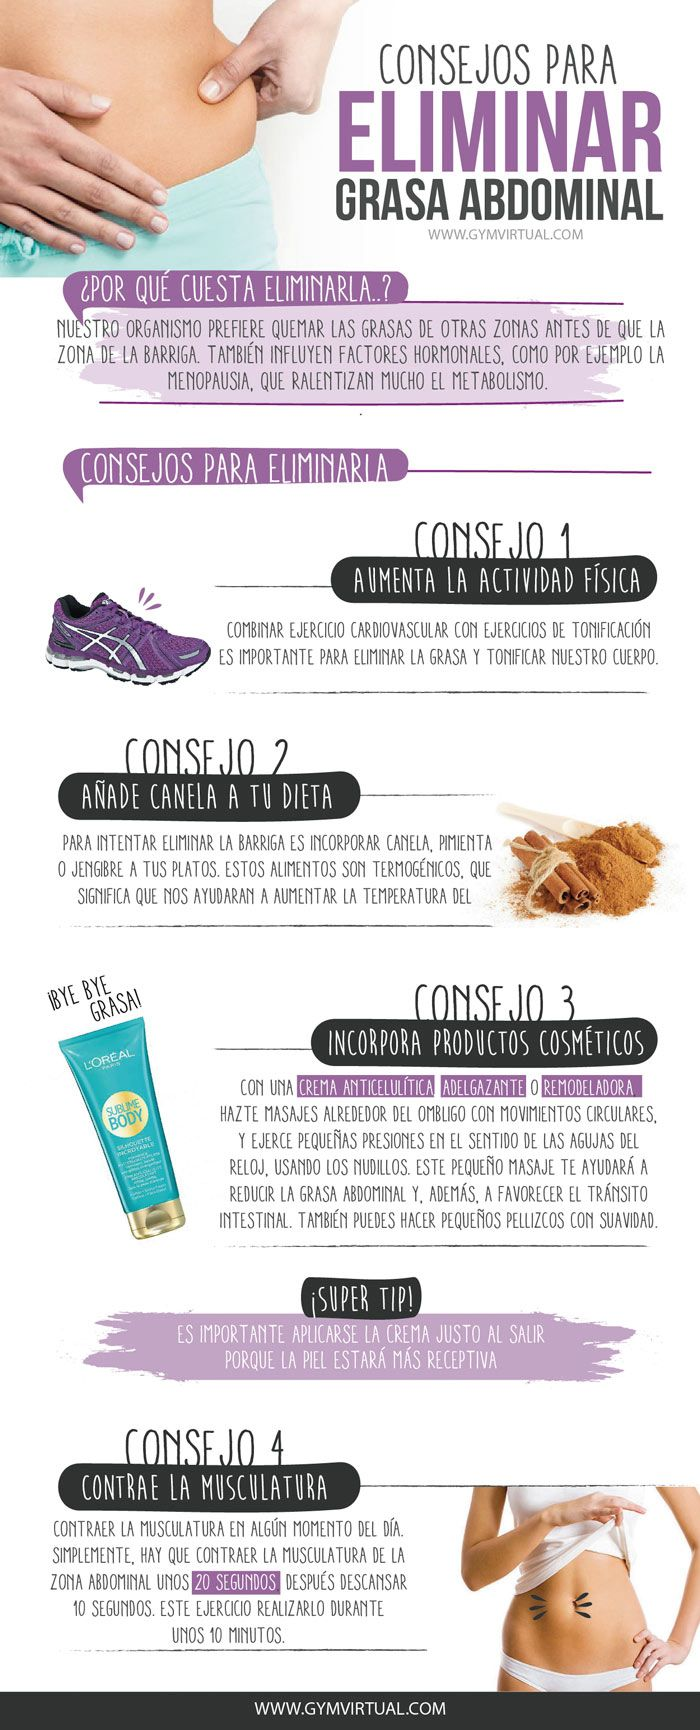 consejos para perder grasa abdominal